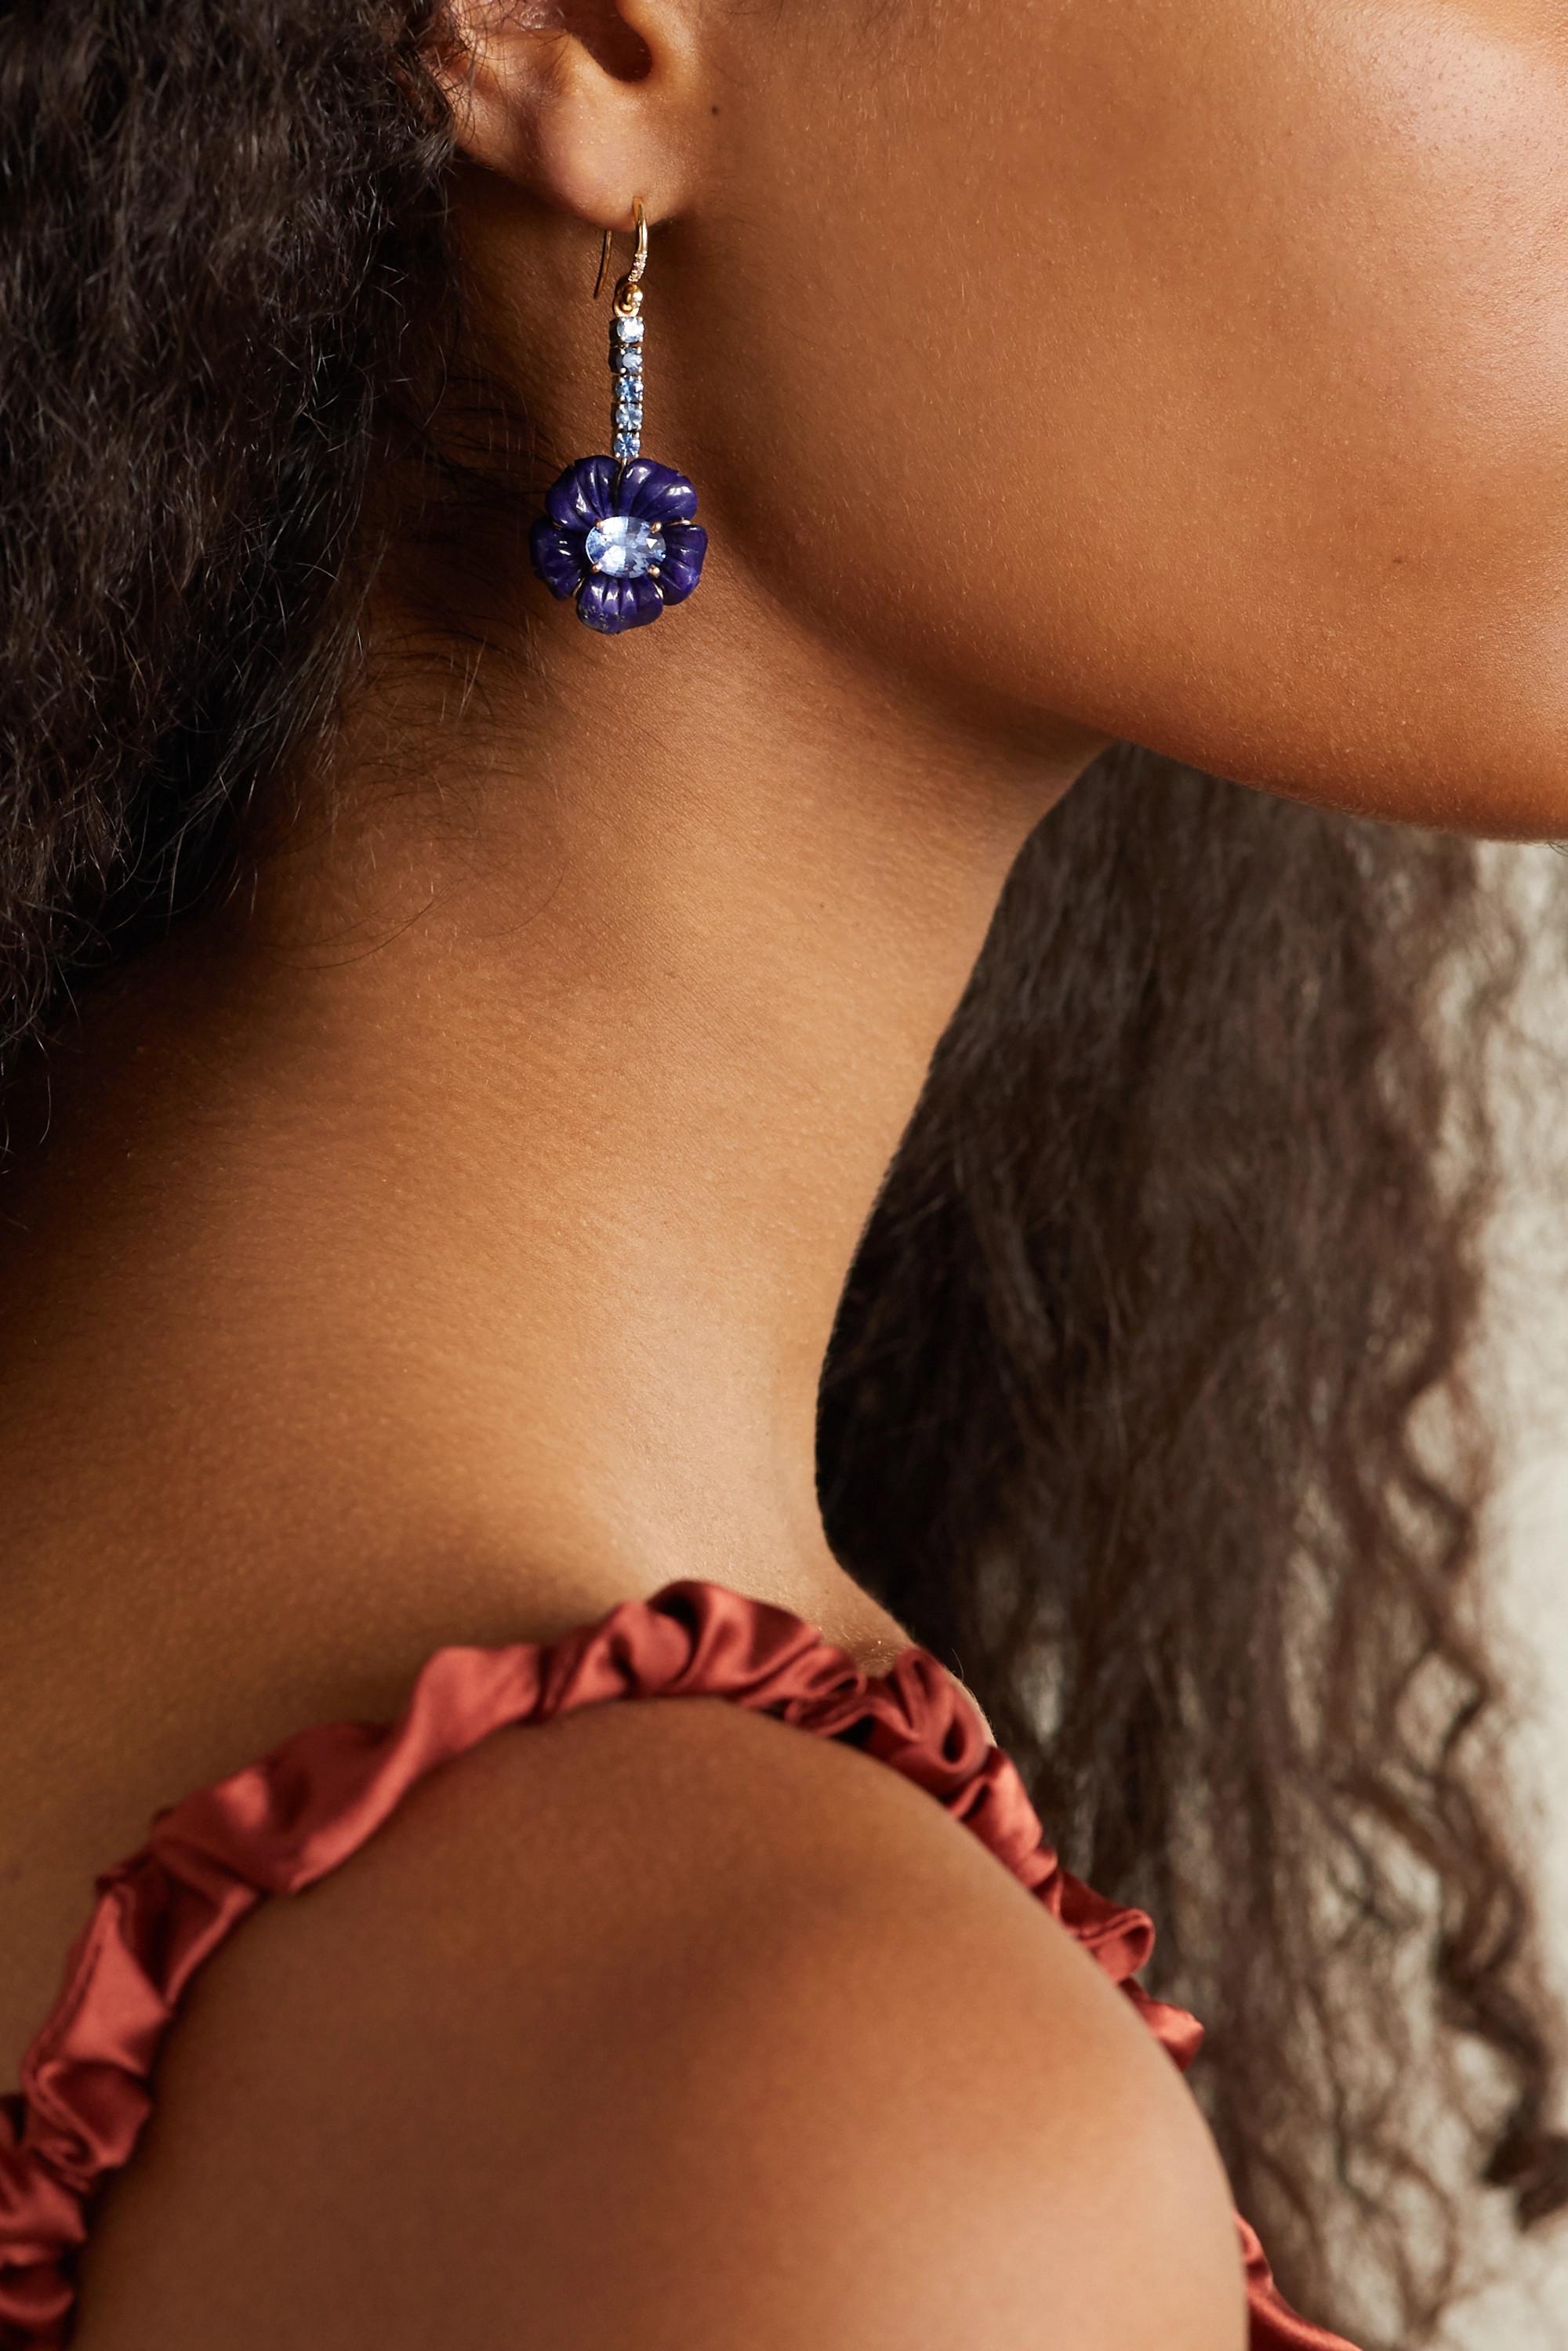 Irene Neuwirth Tropical Flower 18K 玫瑰金、18K 白金、青金石、蓝宝石、钻石耳环